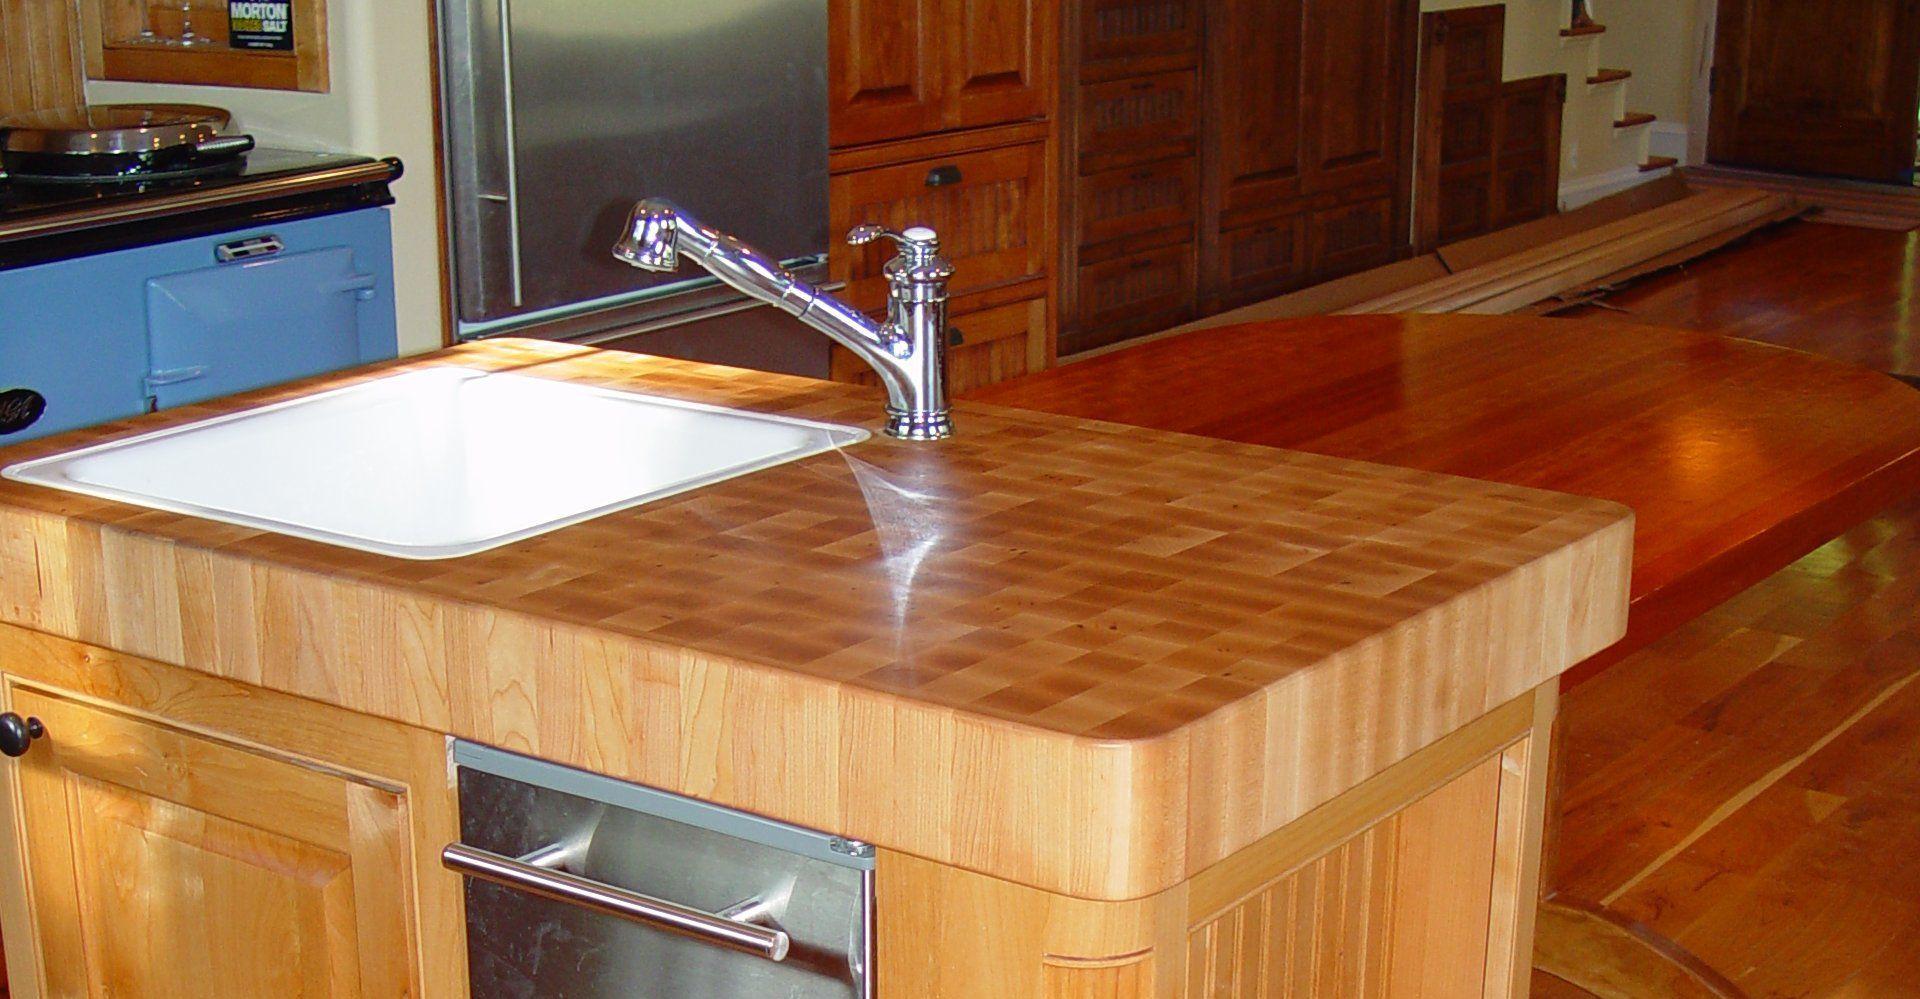 Hard Maple Wood Countertop Photo Gallery By Devos Custom Woodworking